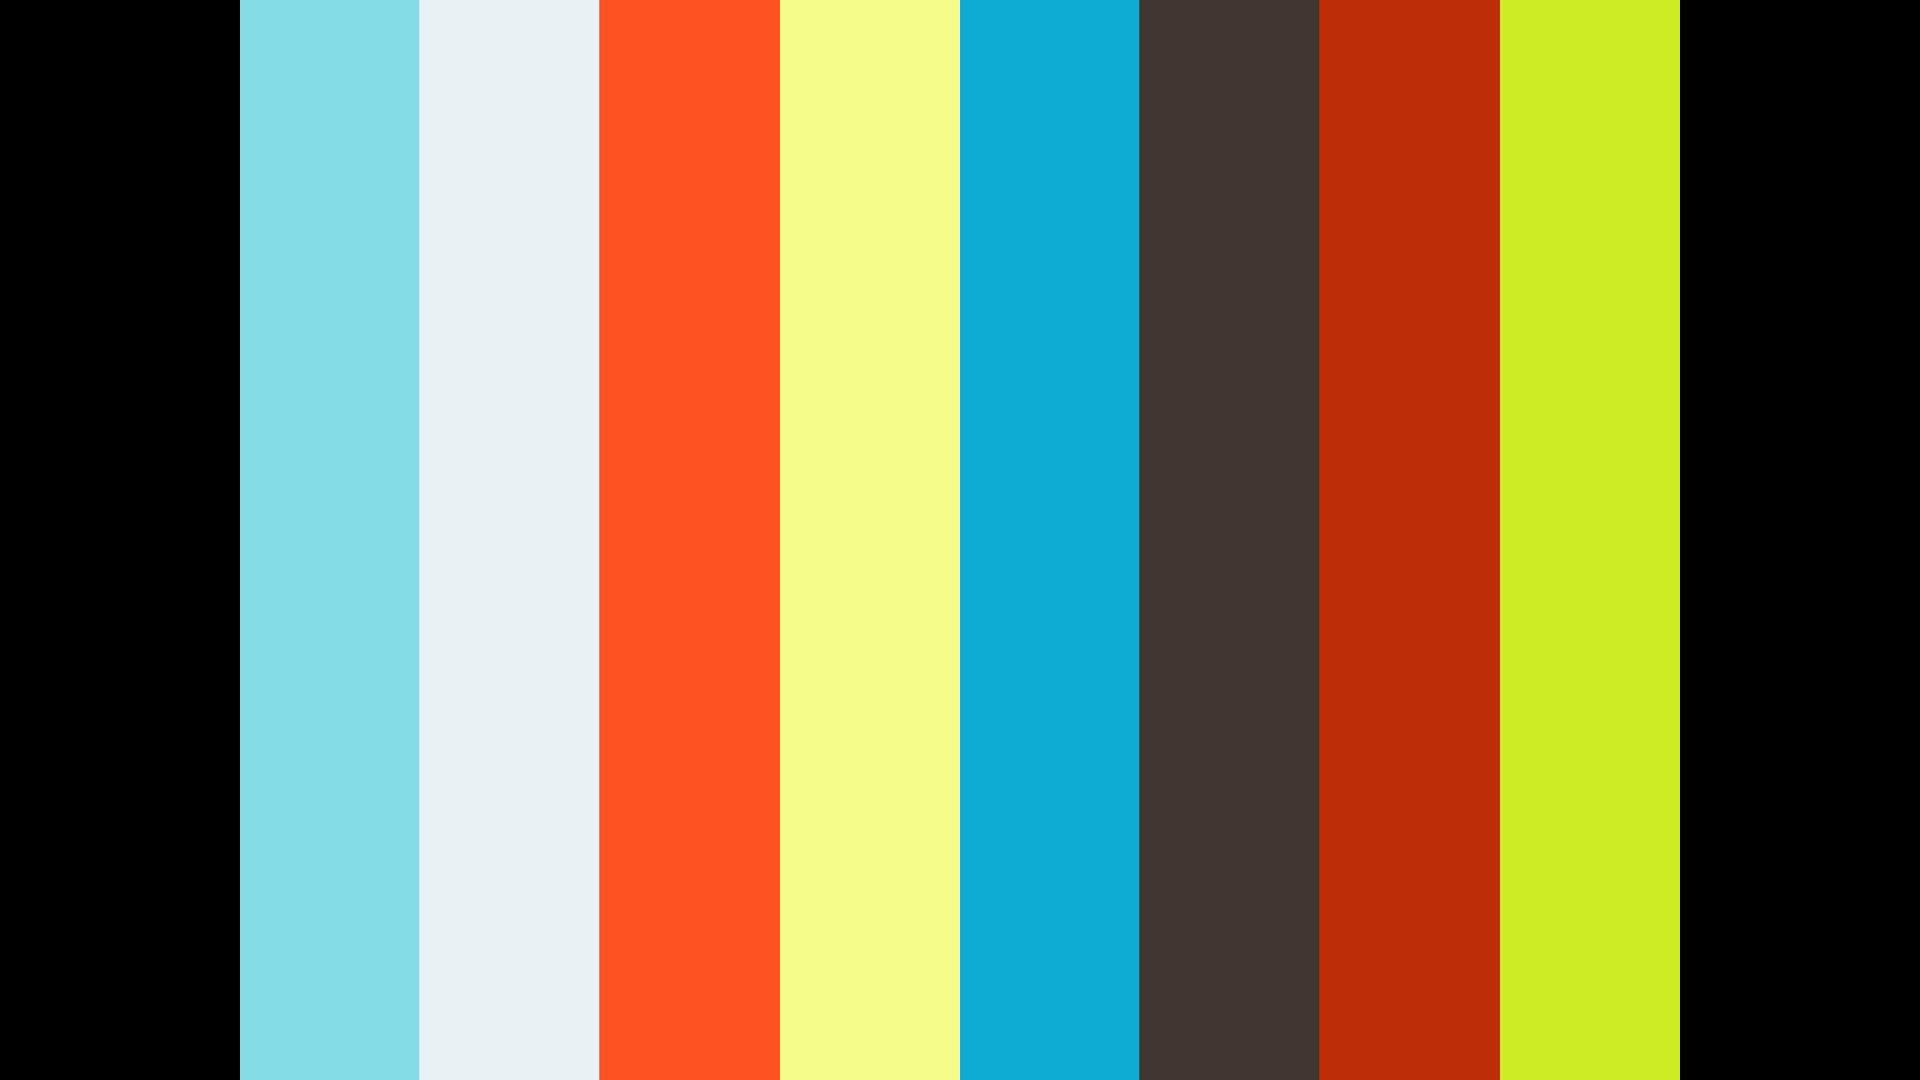 FERN - ABSOLUTE 45 (6 SEPTEMBER 2021)